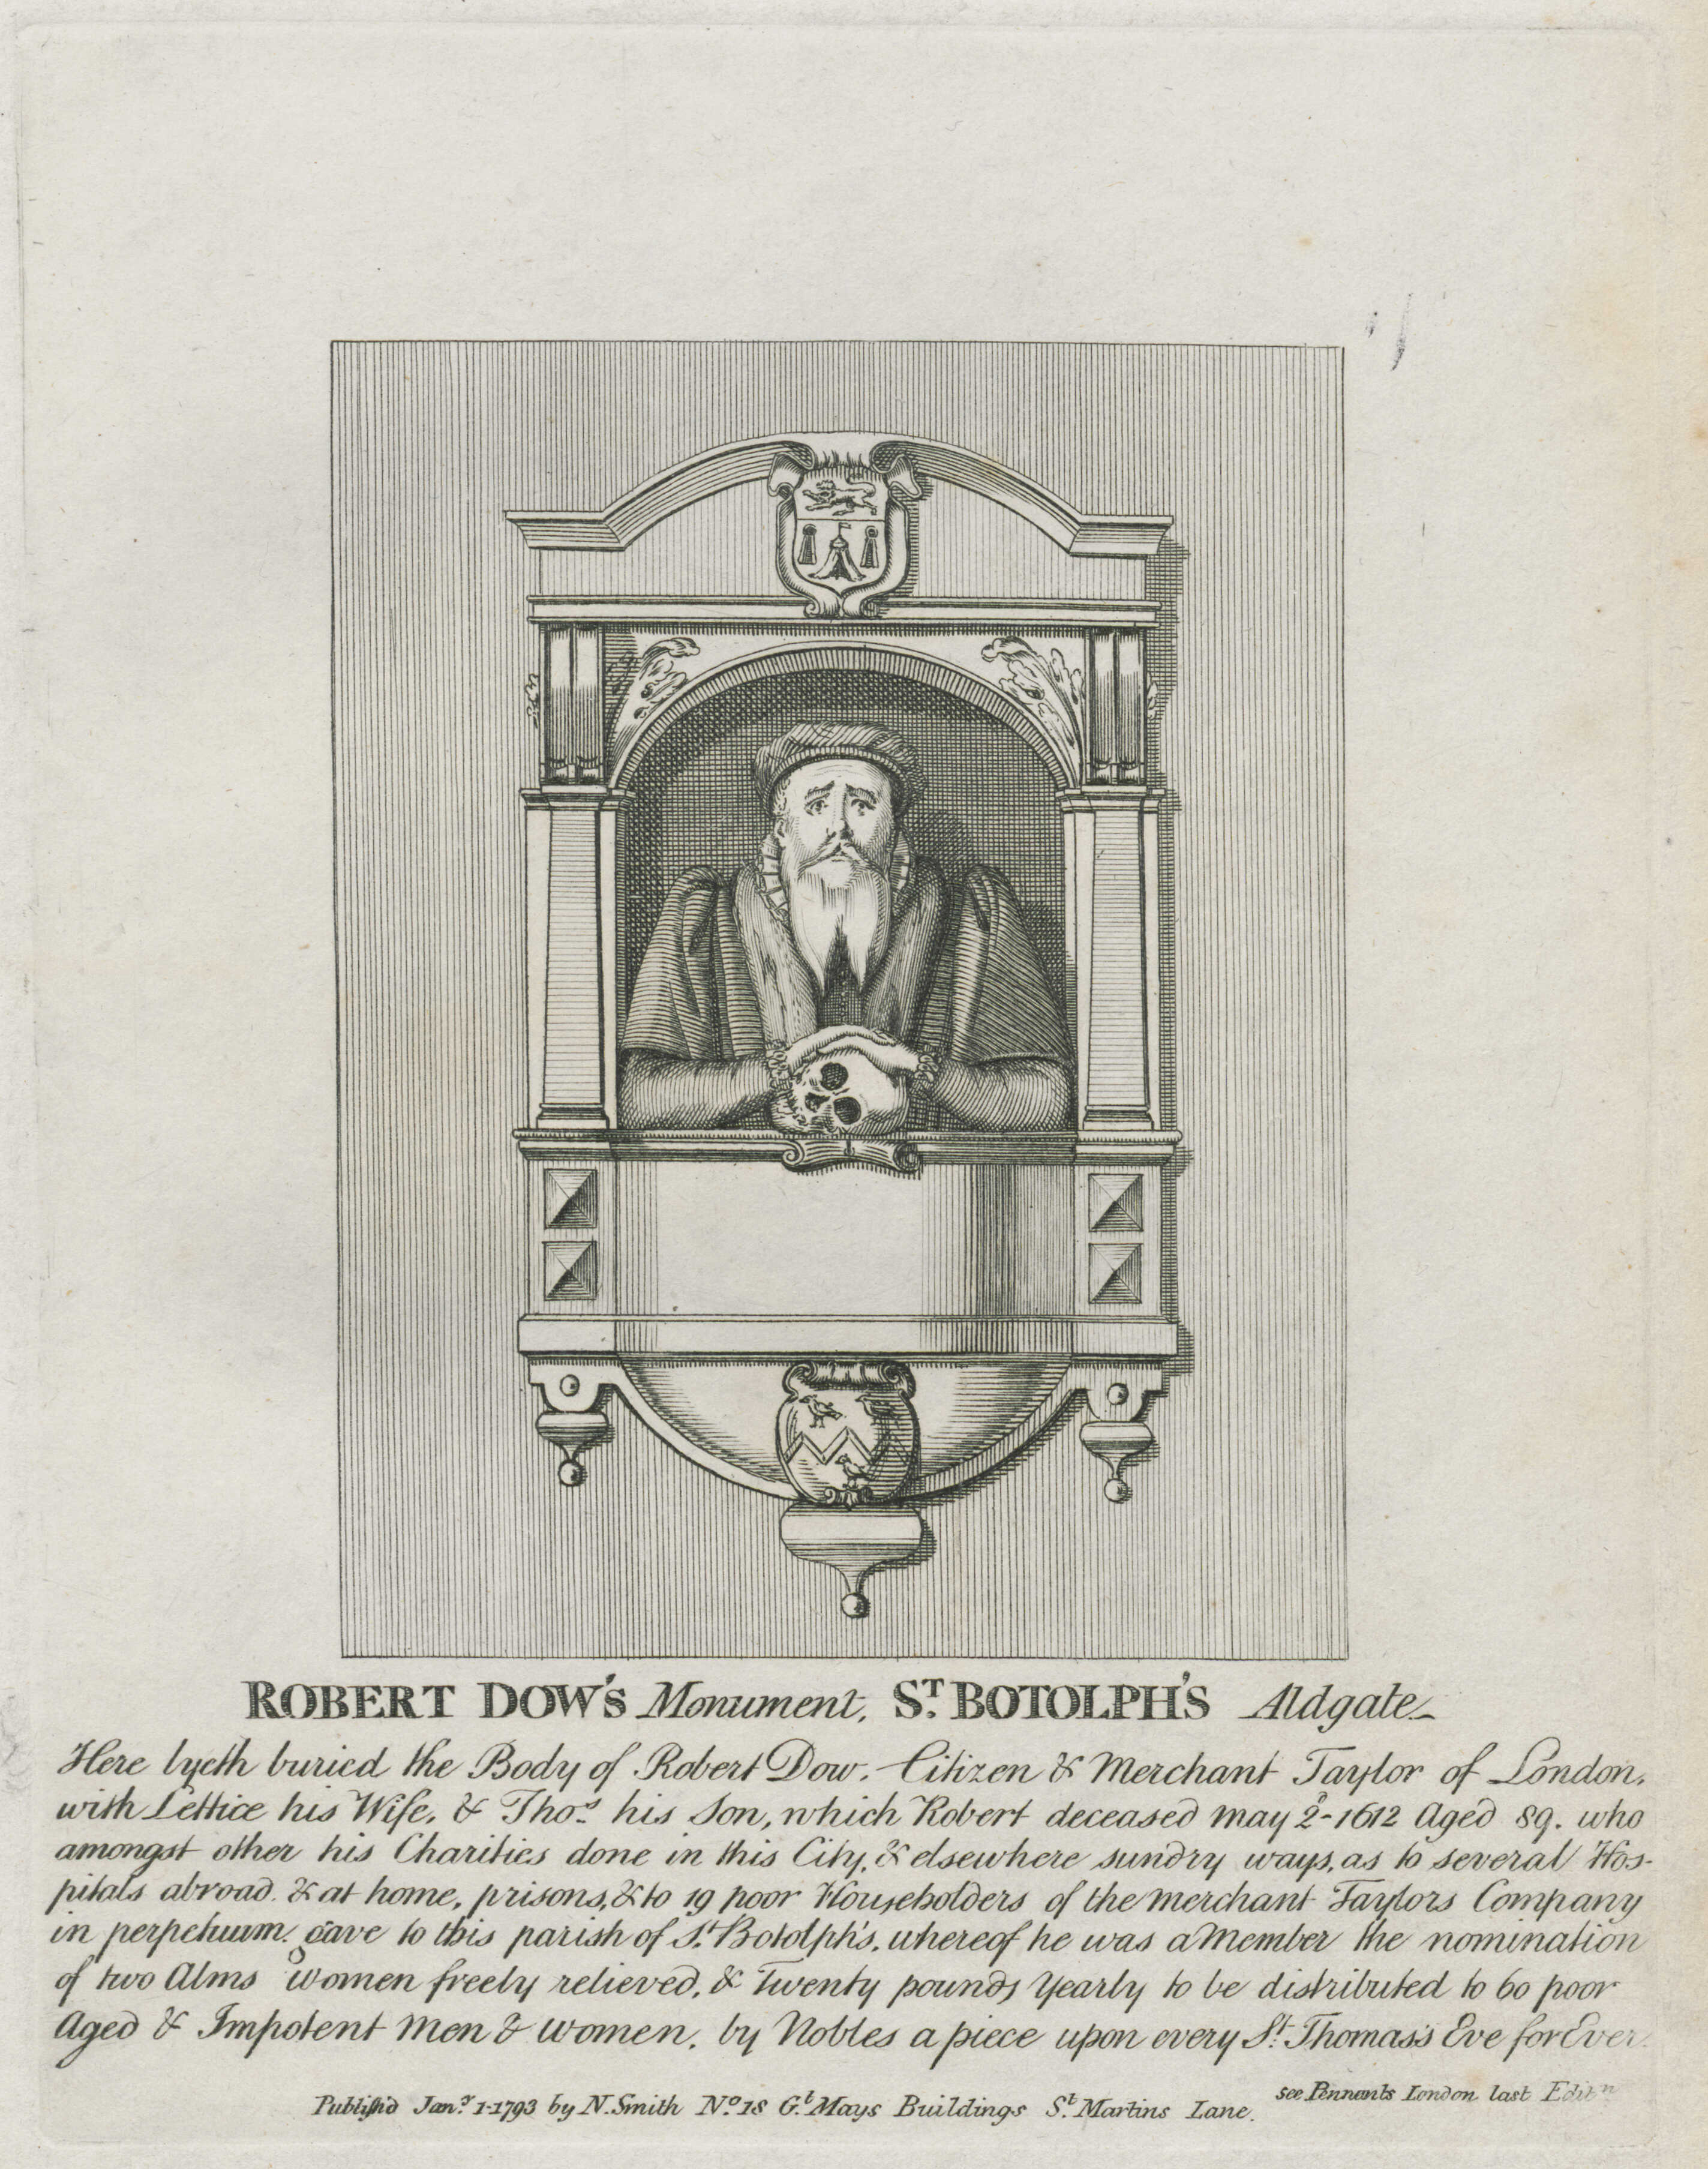 38-robert-dows-monument-st-botolphs-aldgate